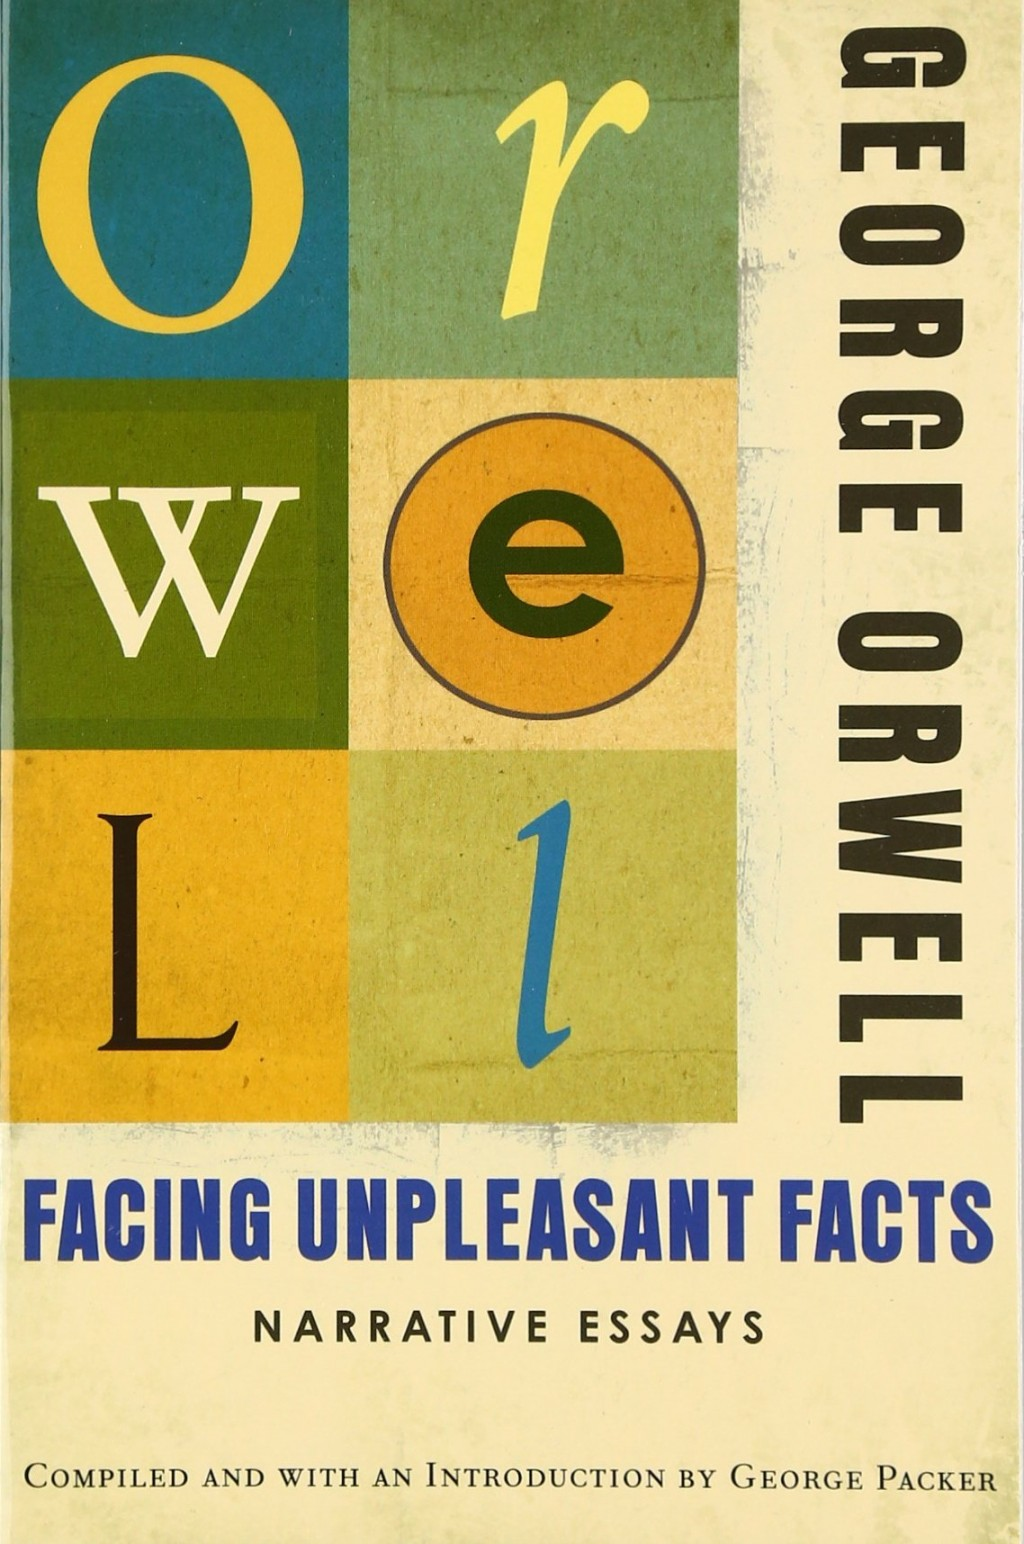 023 Essay Example 817mi1ypesl George Orwell Frightening Essays 1984 Summary Collected Pdf On Writing Large